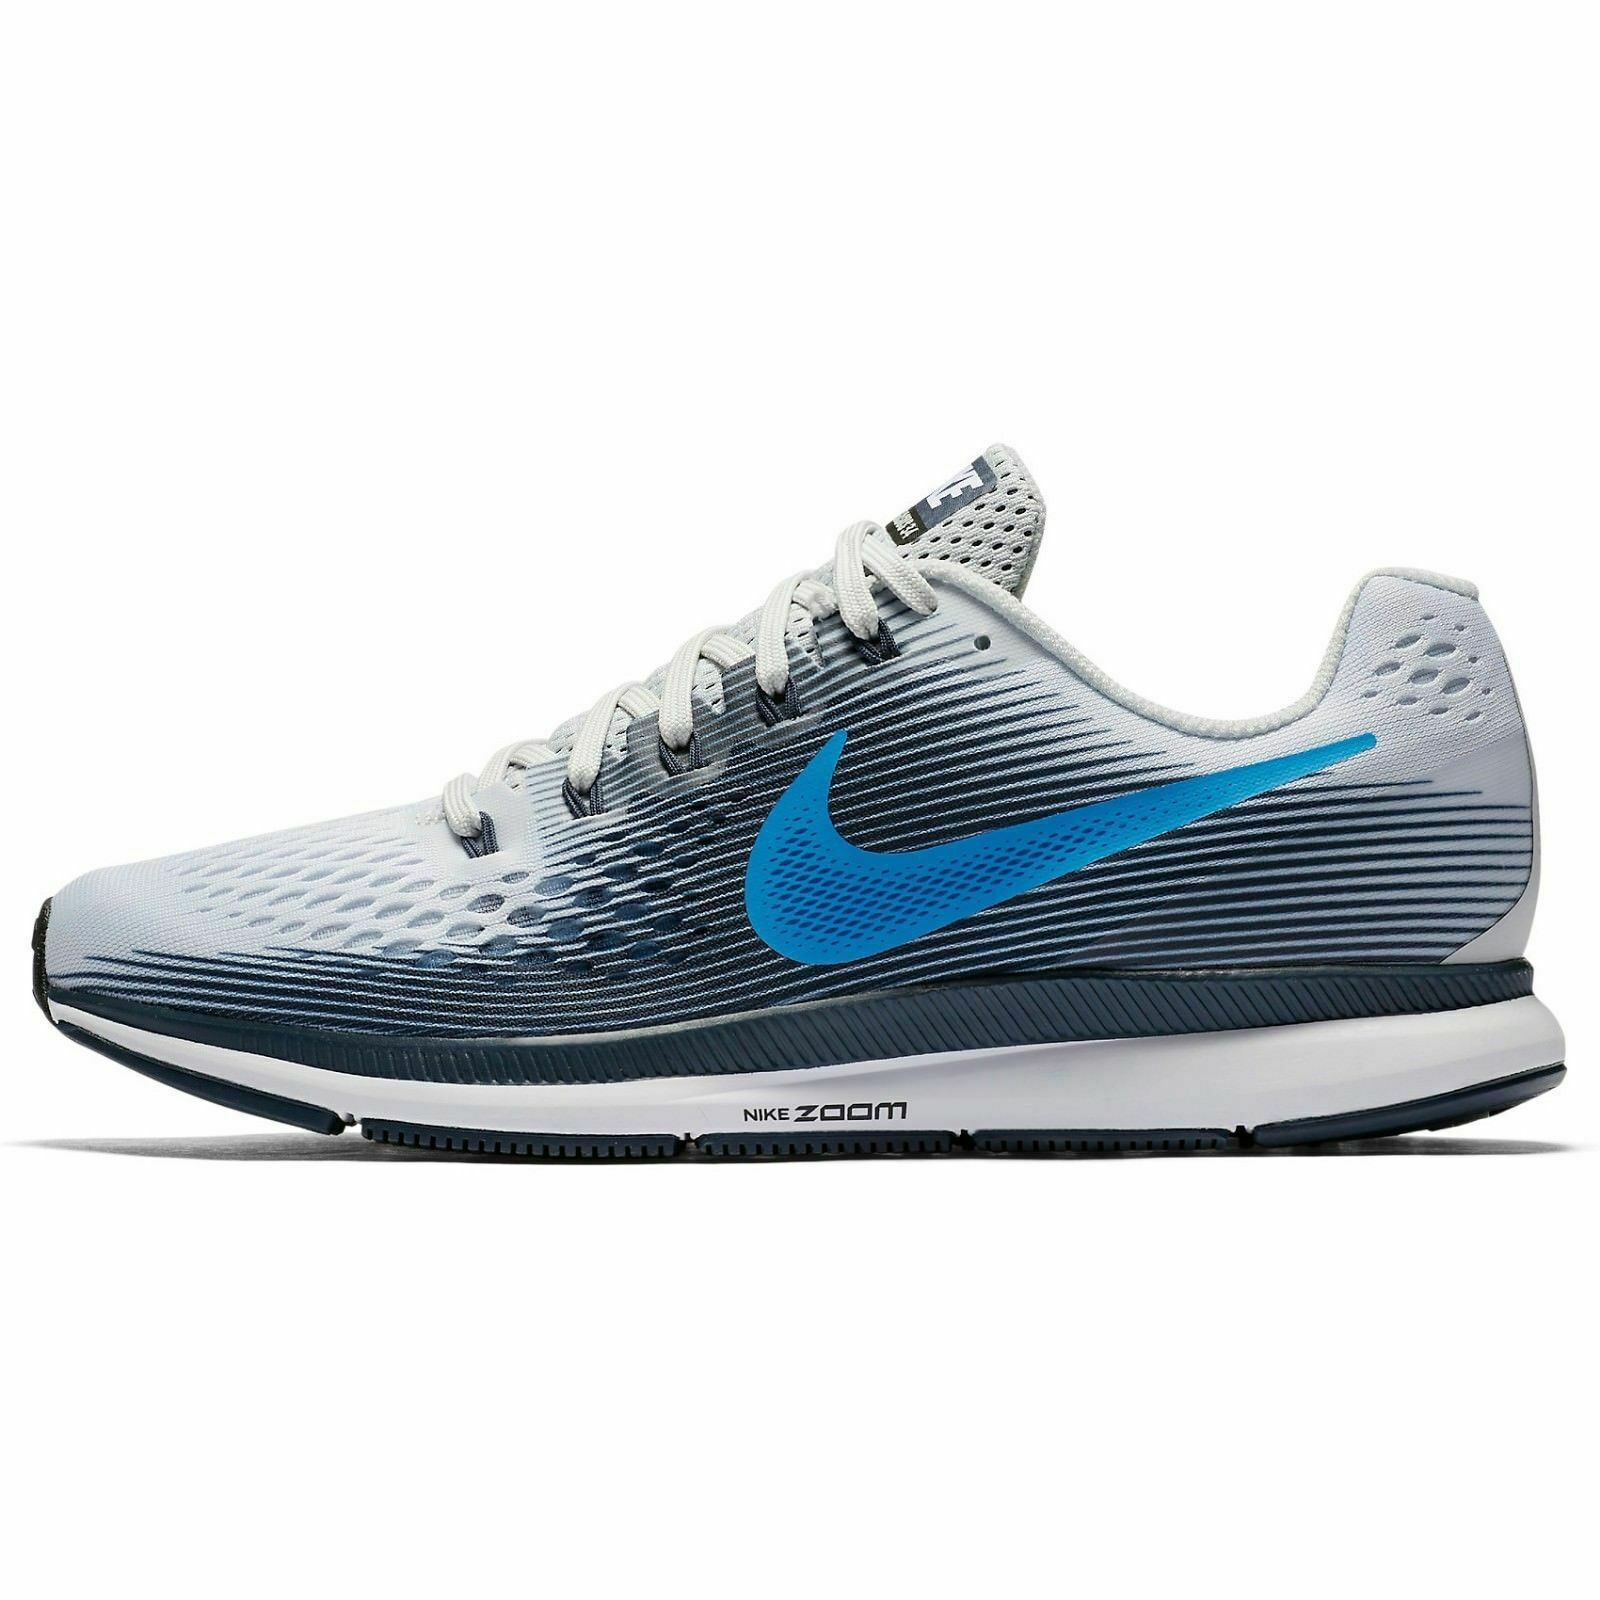 NIB Nike Air Zoom Pegasus 34 Platinum bluee White Sneakers 880555-008 MEN'S Sz 11